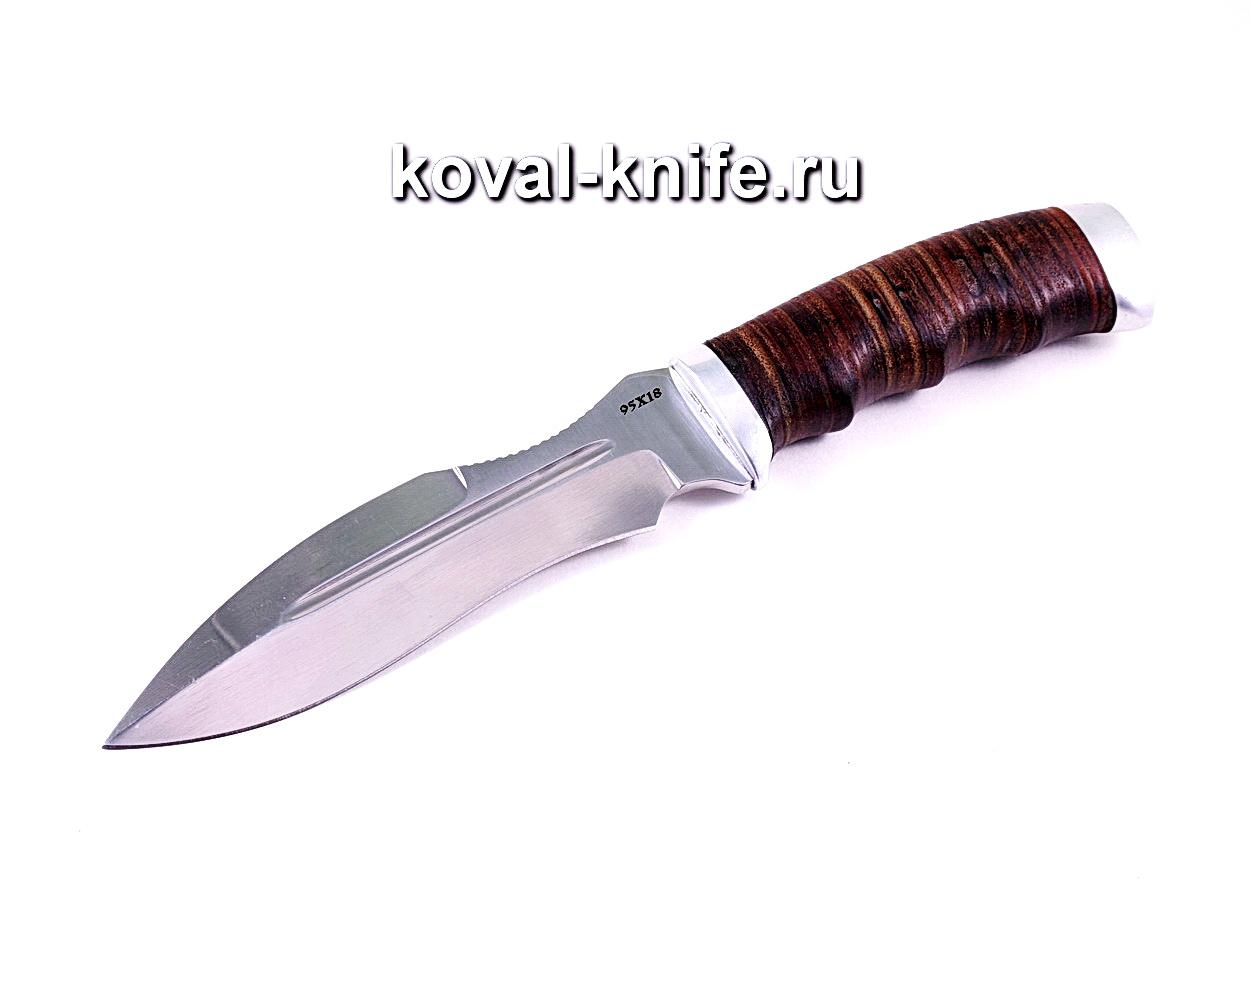 Нож Каратель (сталь 95х18), рукоять кожа